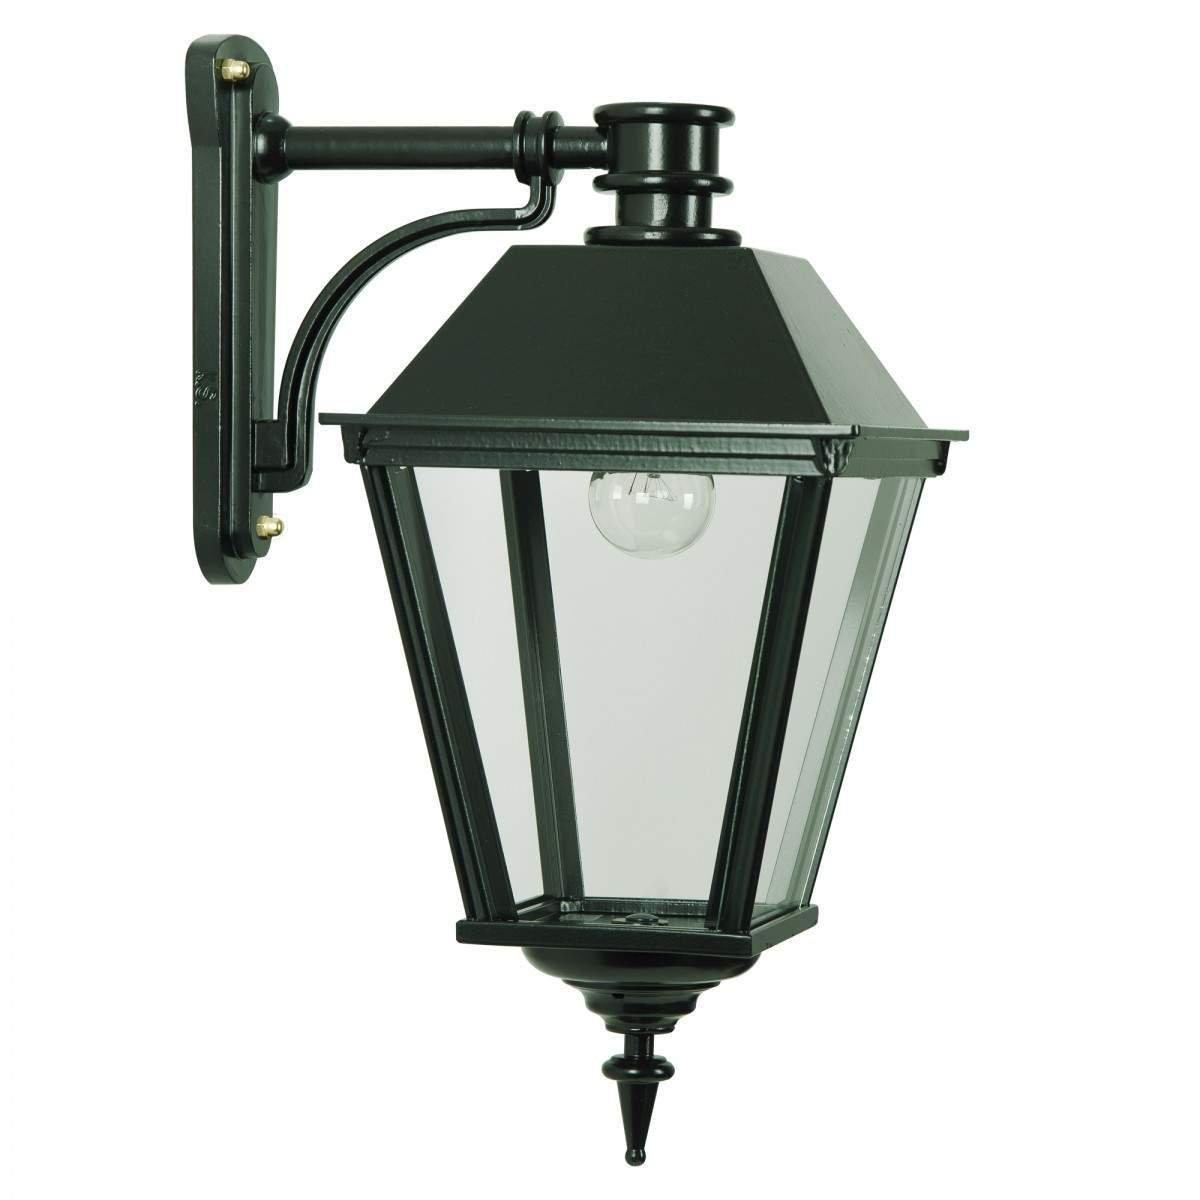 KS Verlichting Oudhollandse wandlamp Halle KS 6509